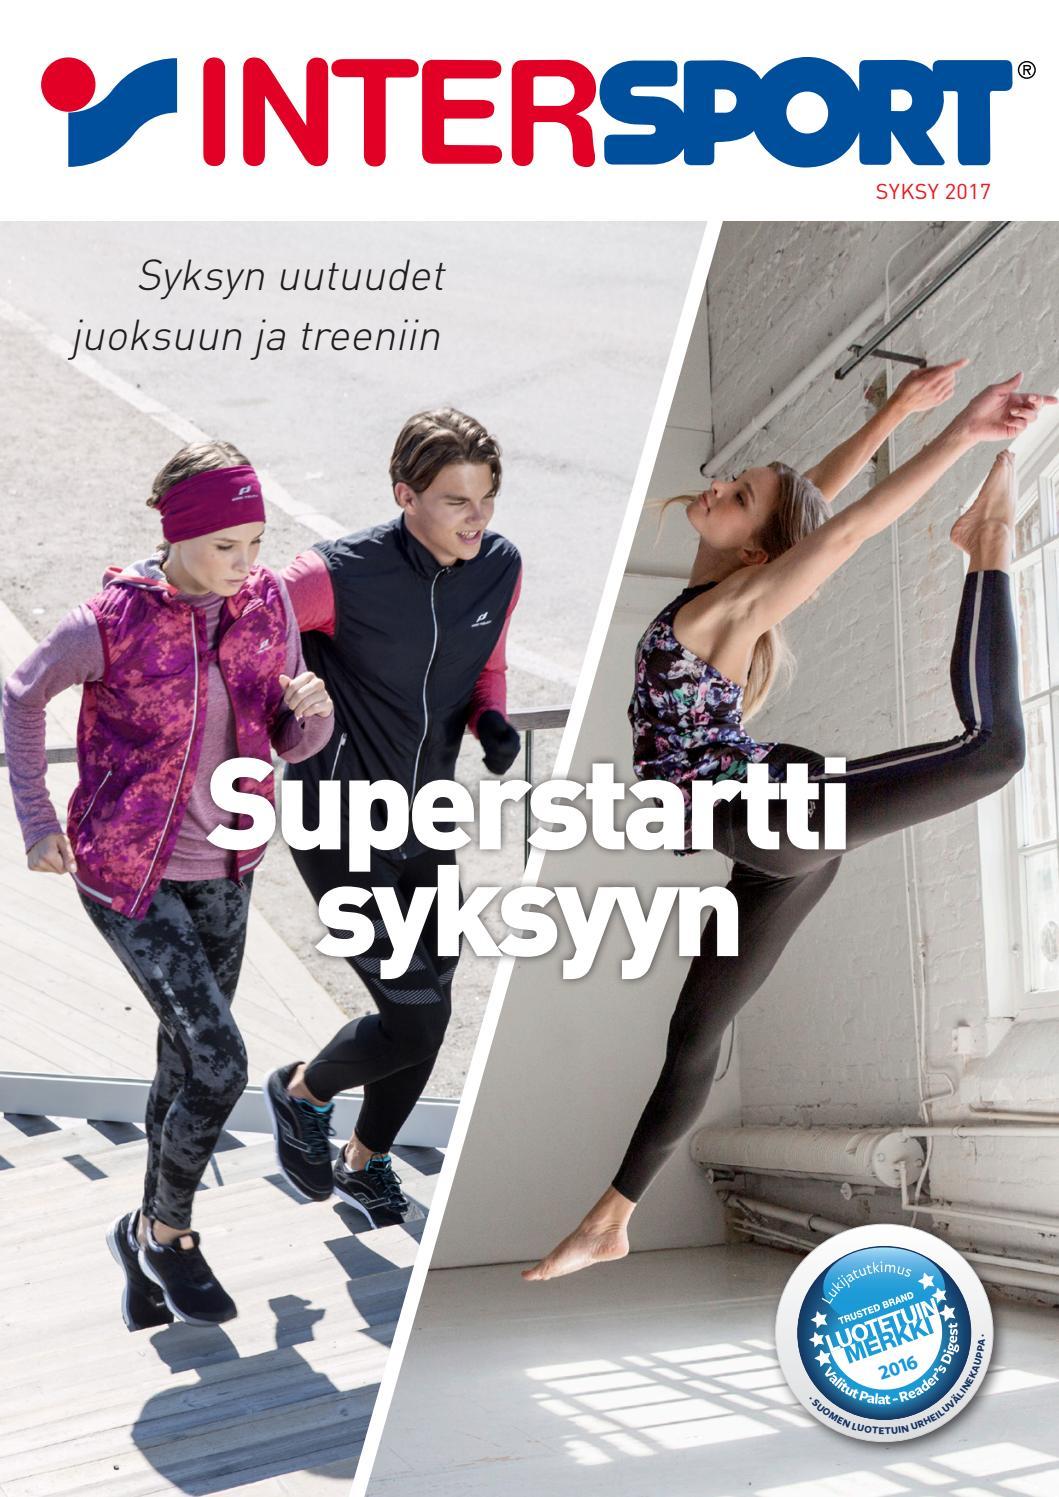 c97a546d3c949 Superstartti syksyyn   Juoksu ja treeni by Intersport Finland - issuu